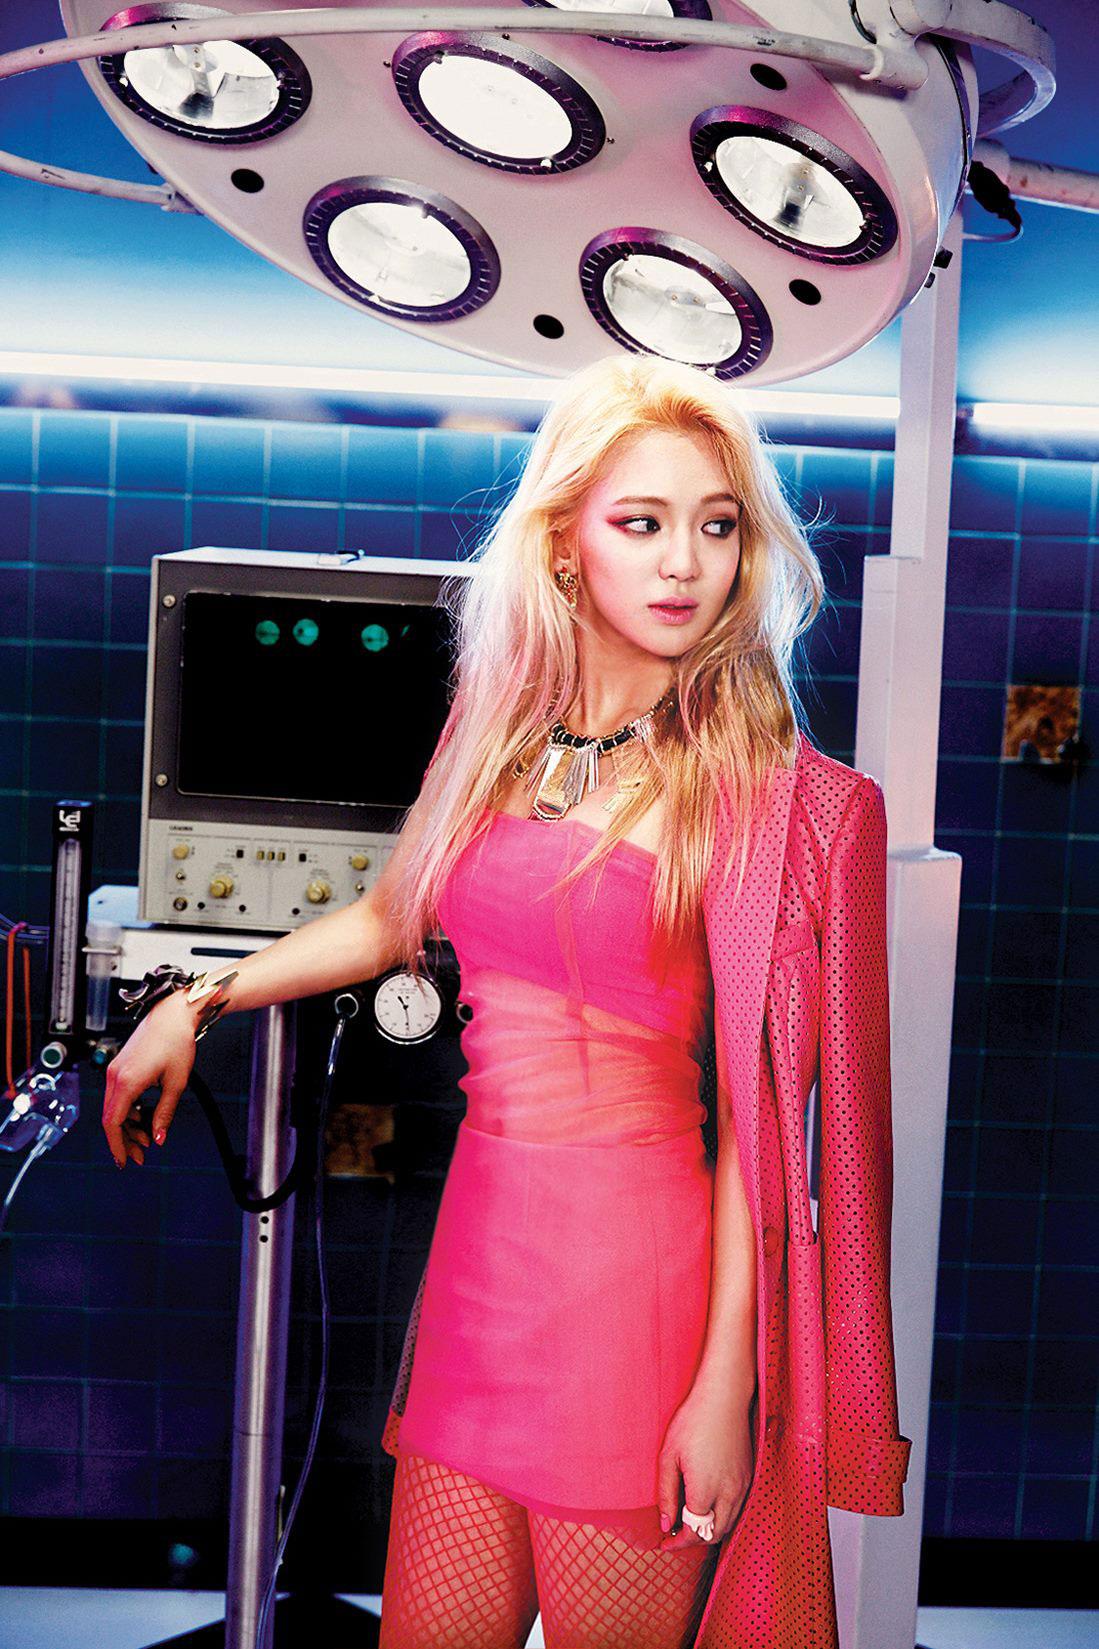 Girl Generation 2014 Wallpaper Jessica Sunny Hyoyeon Mr Mr Hd Concept Image Snsd Pics